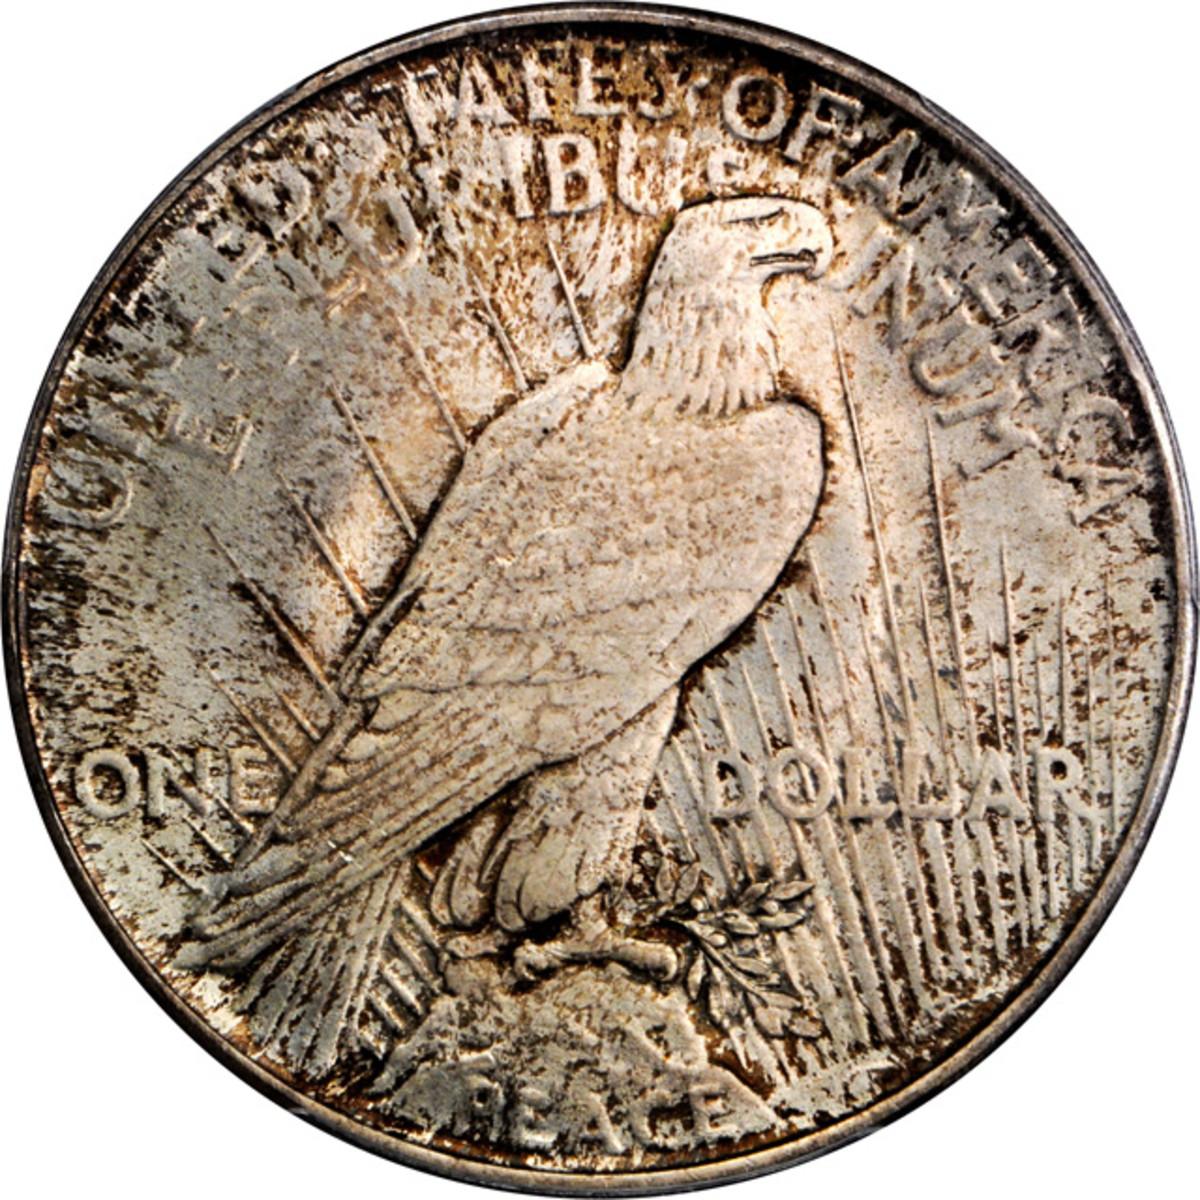 Lot 13170. 1922 Peace silver dollar. Early hub dies. PCGS MS-67. Ex: Raymond T. Baker Estate.